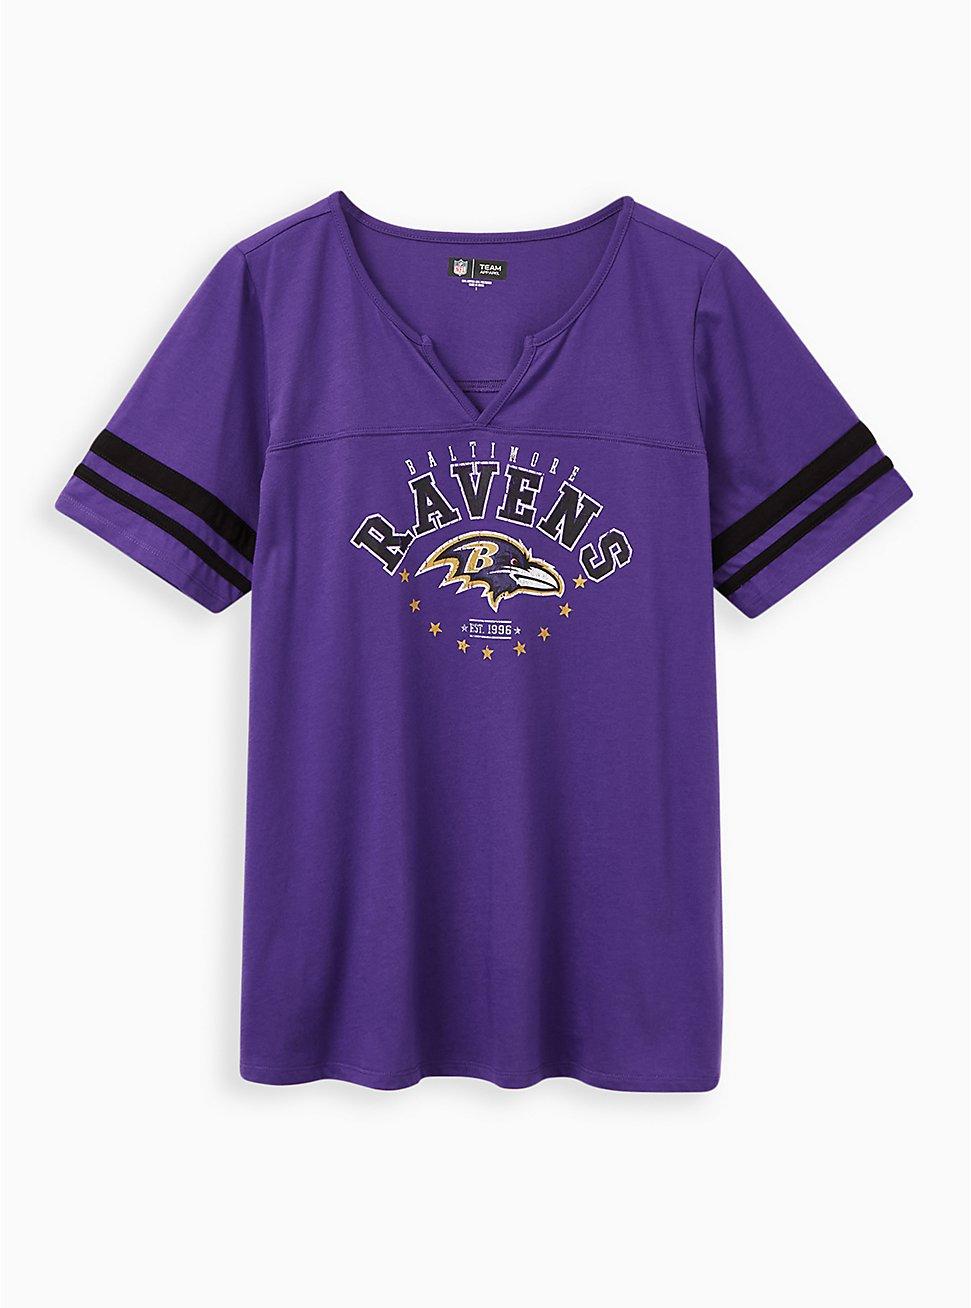 Classic Fit Football Tee - NFL Baltimore Ravens Purple, PURPLE, hi-res